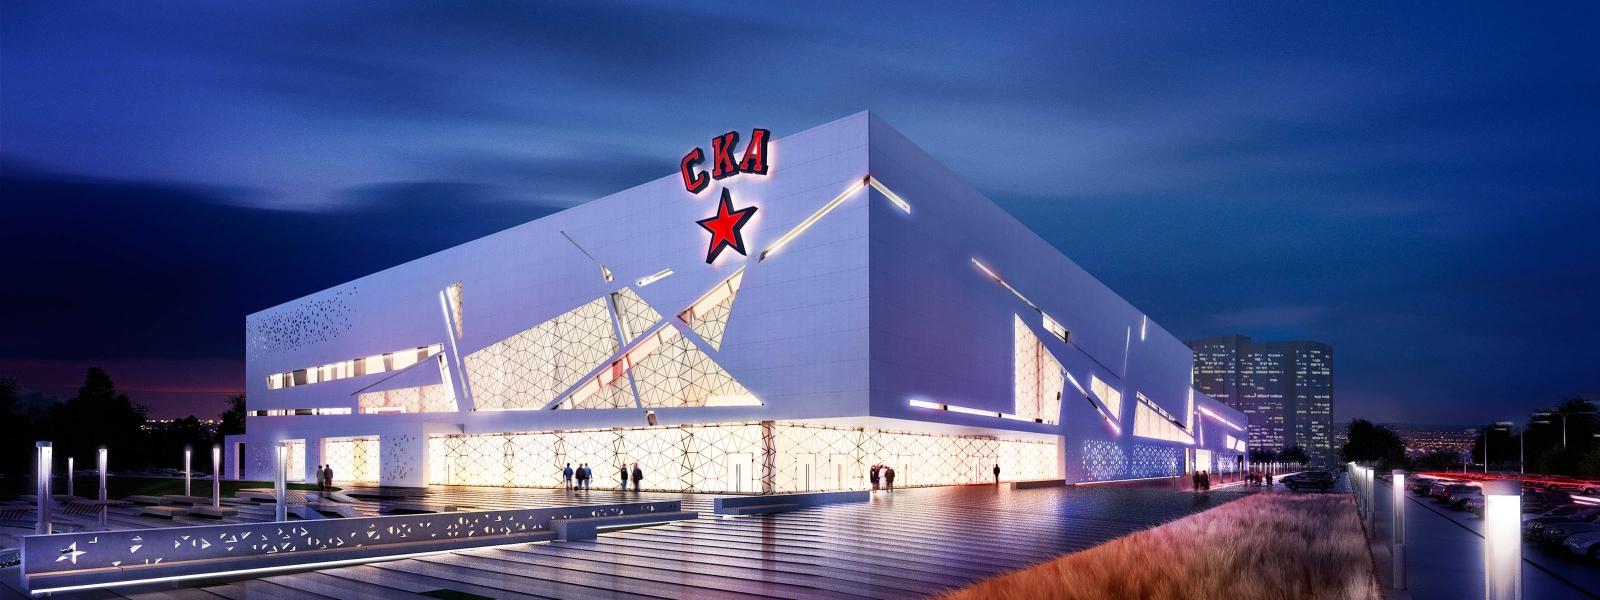 work-Проект спортивного комплекса для команды СКА